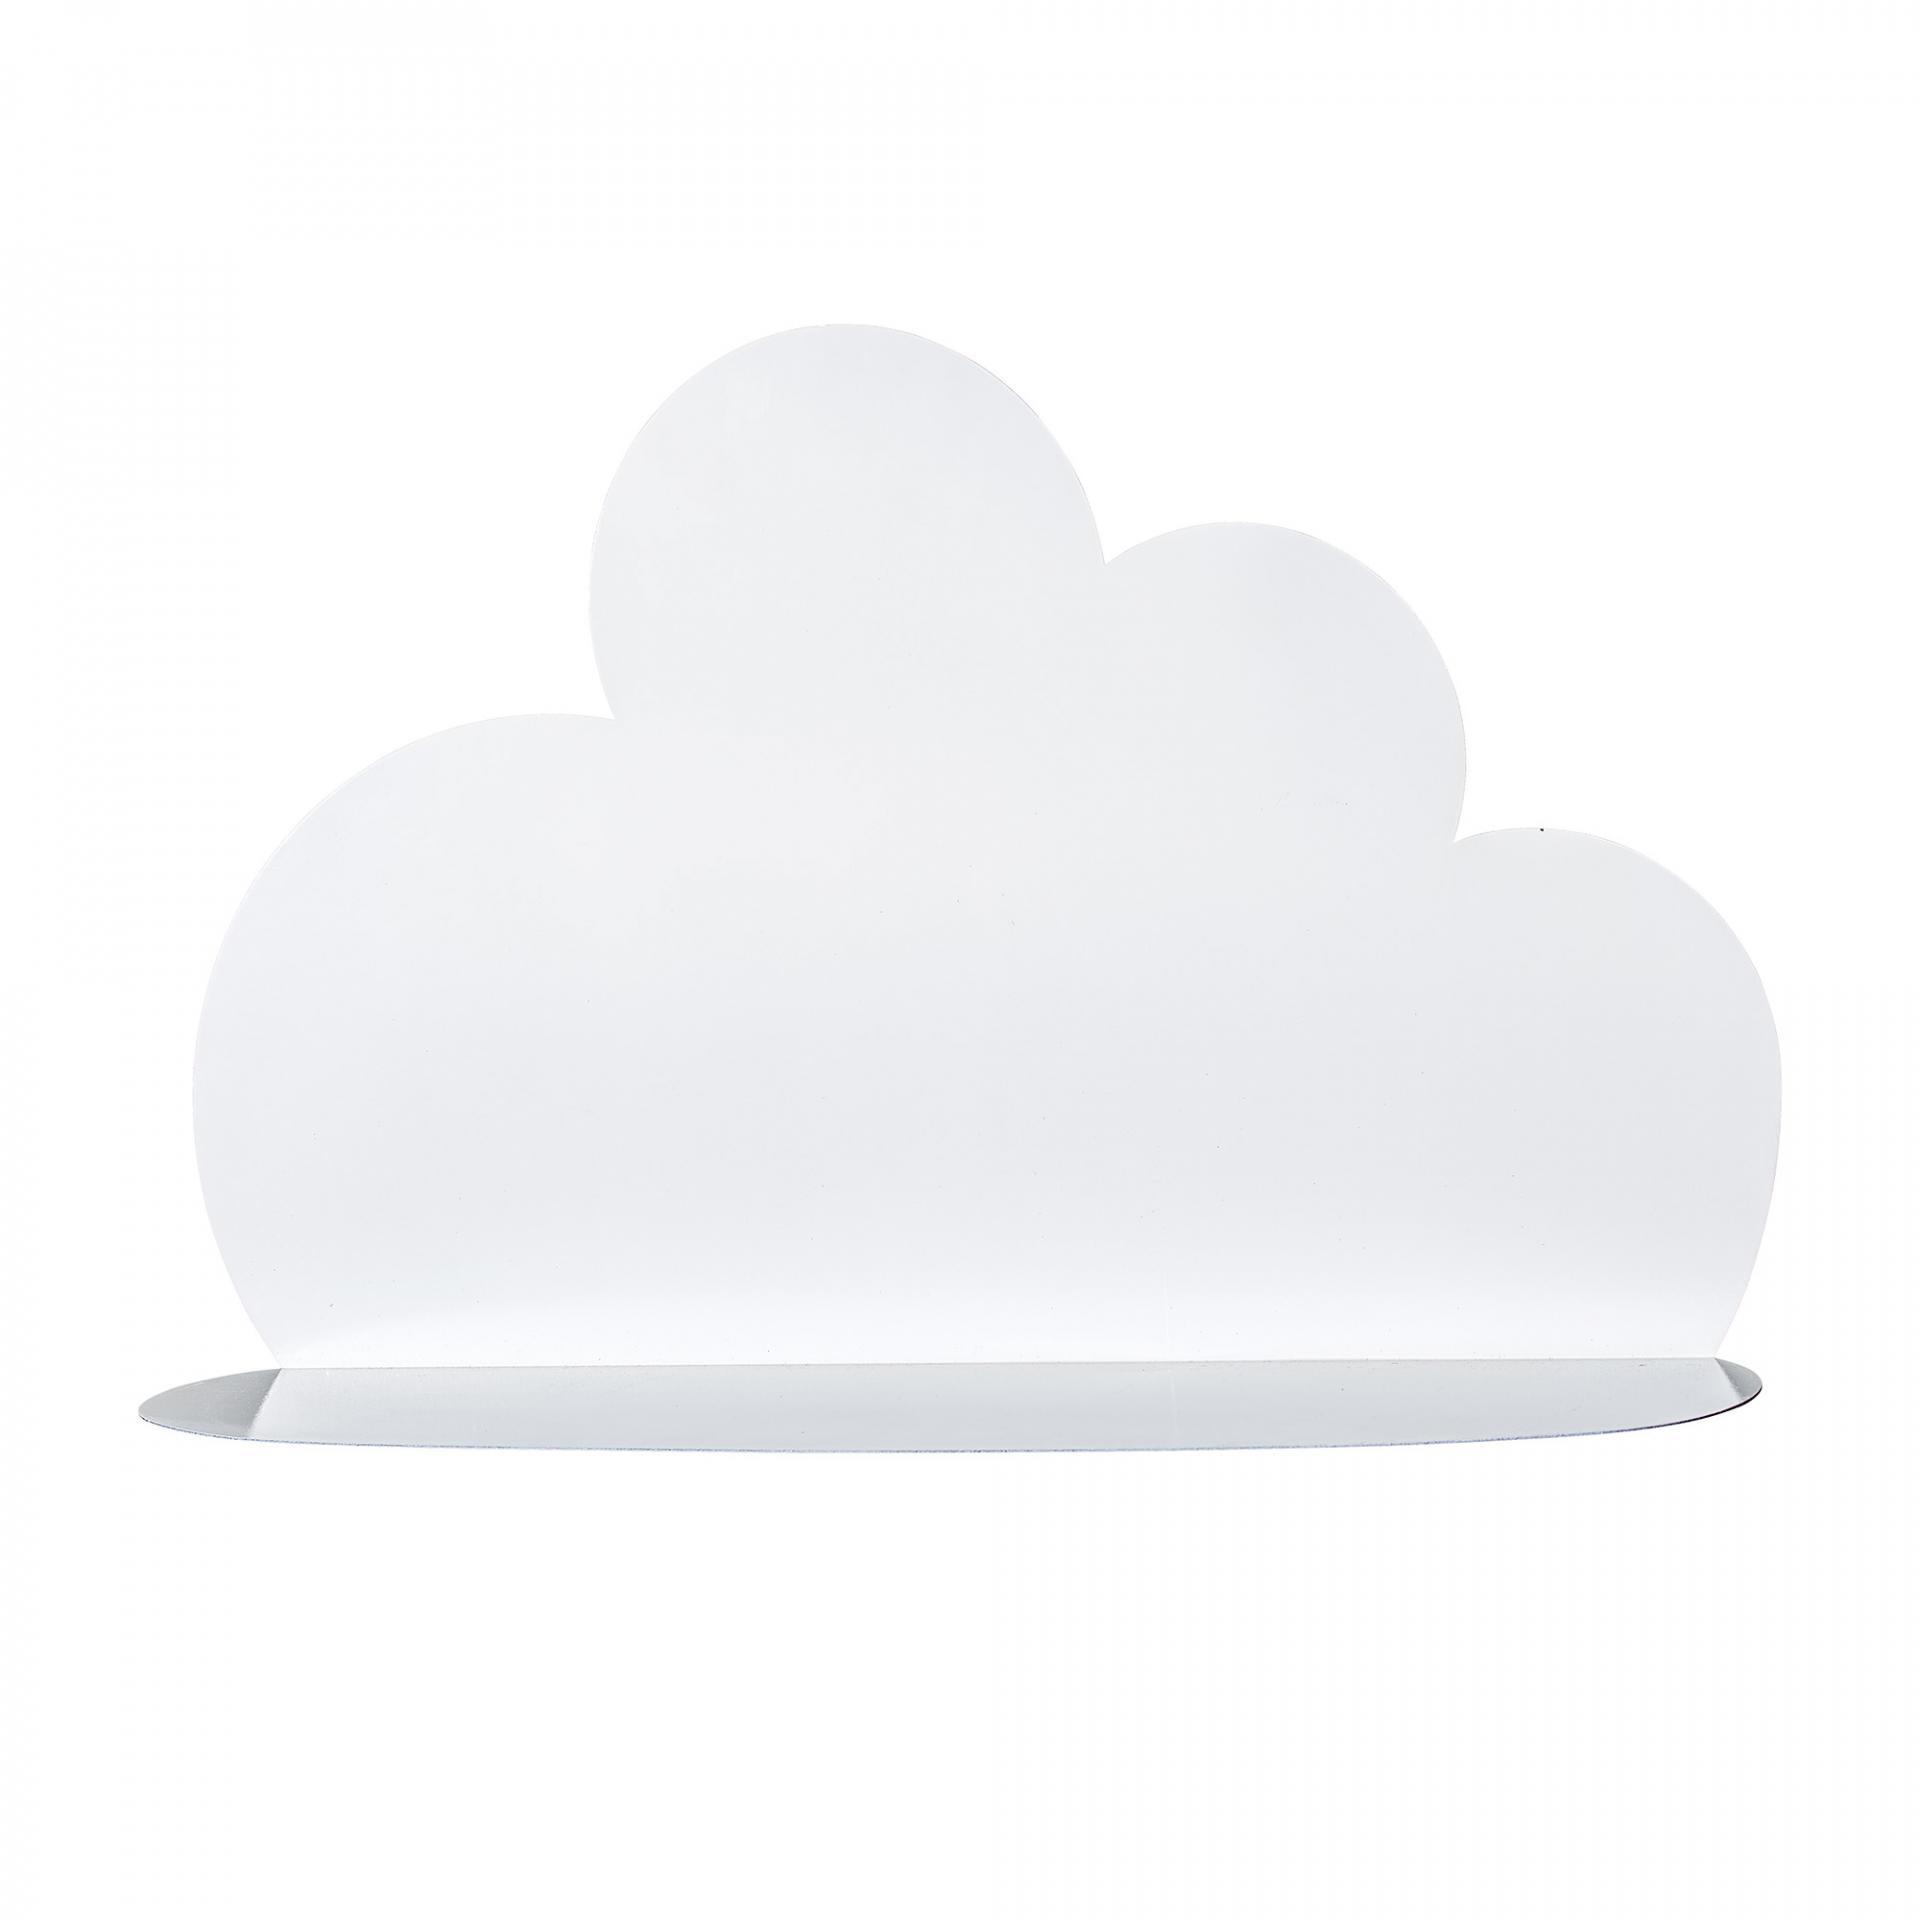 Bloomingville Kovová polička Cloud White - větší, bílá barva, kov